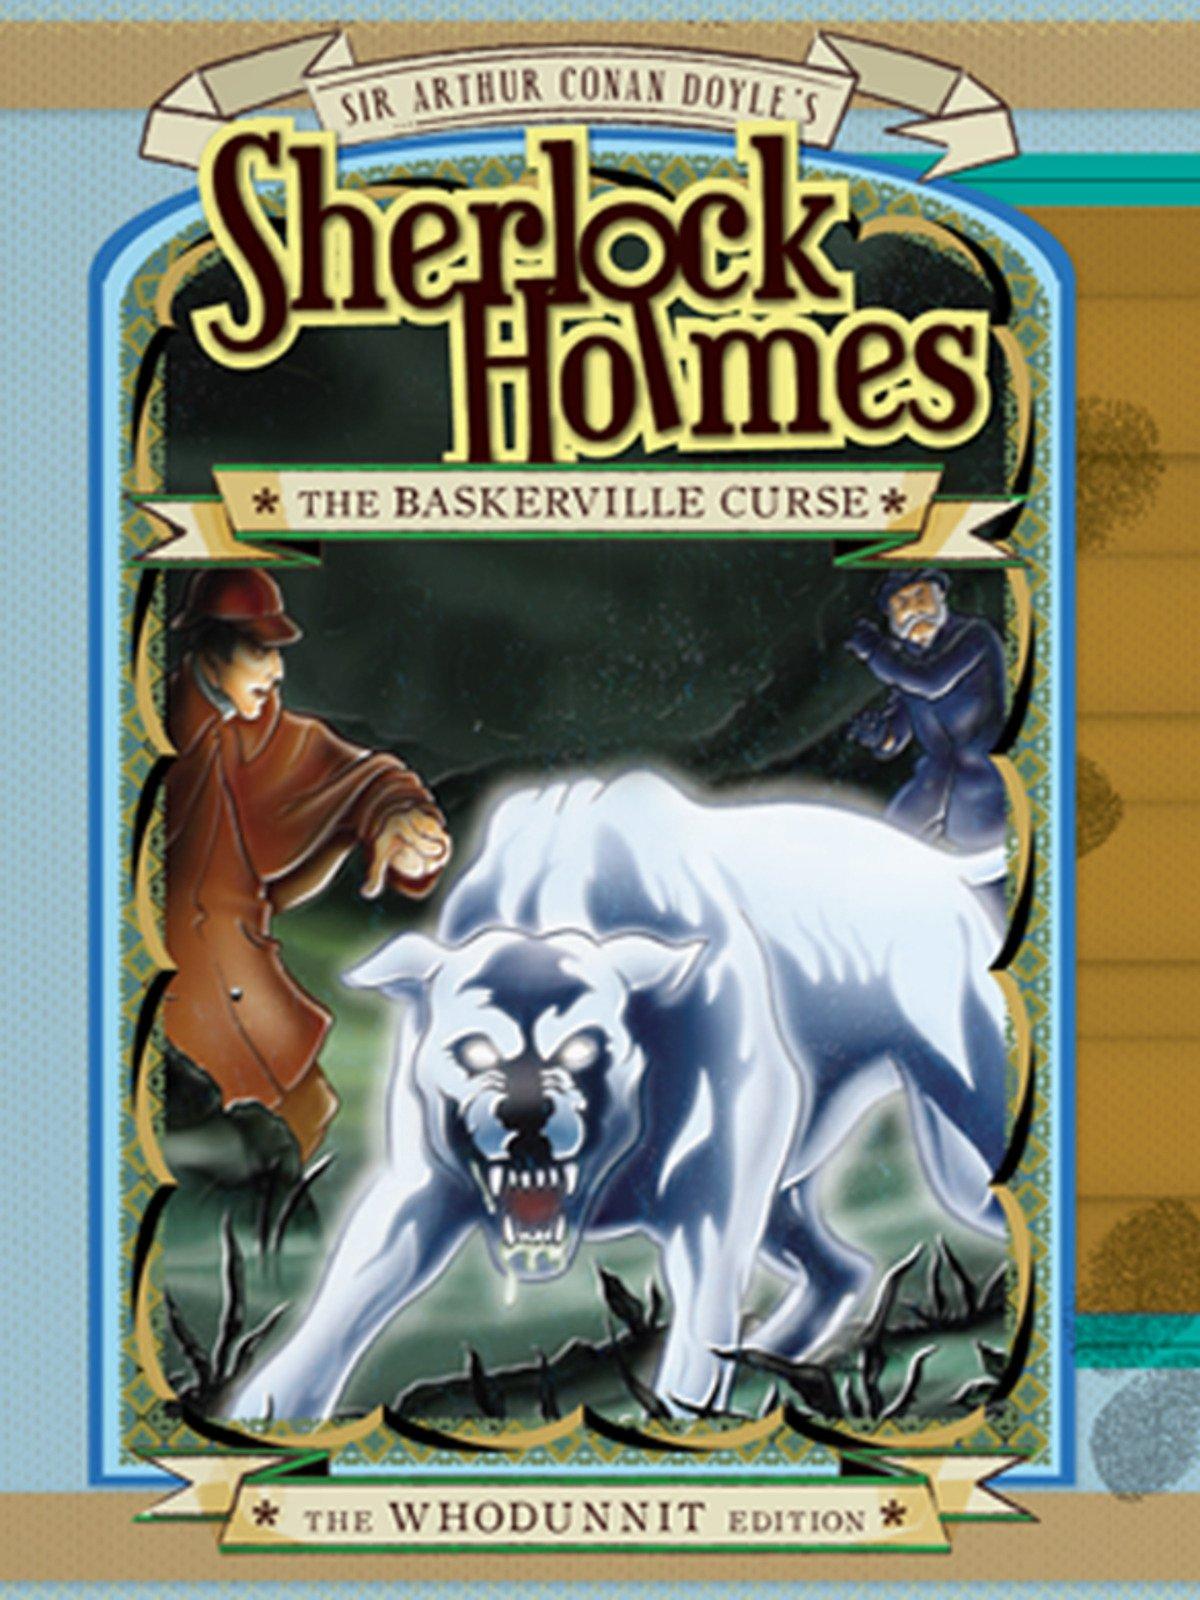 Sherlock Holmes: The Baskersville Curse